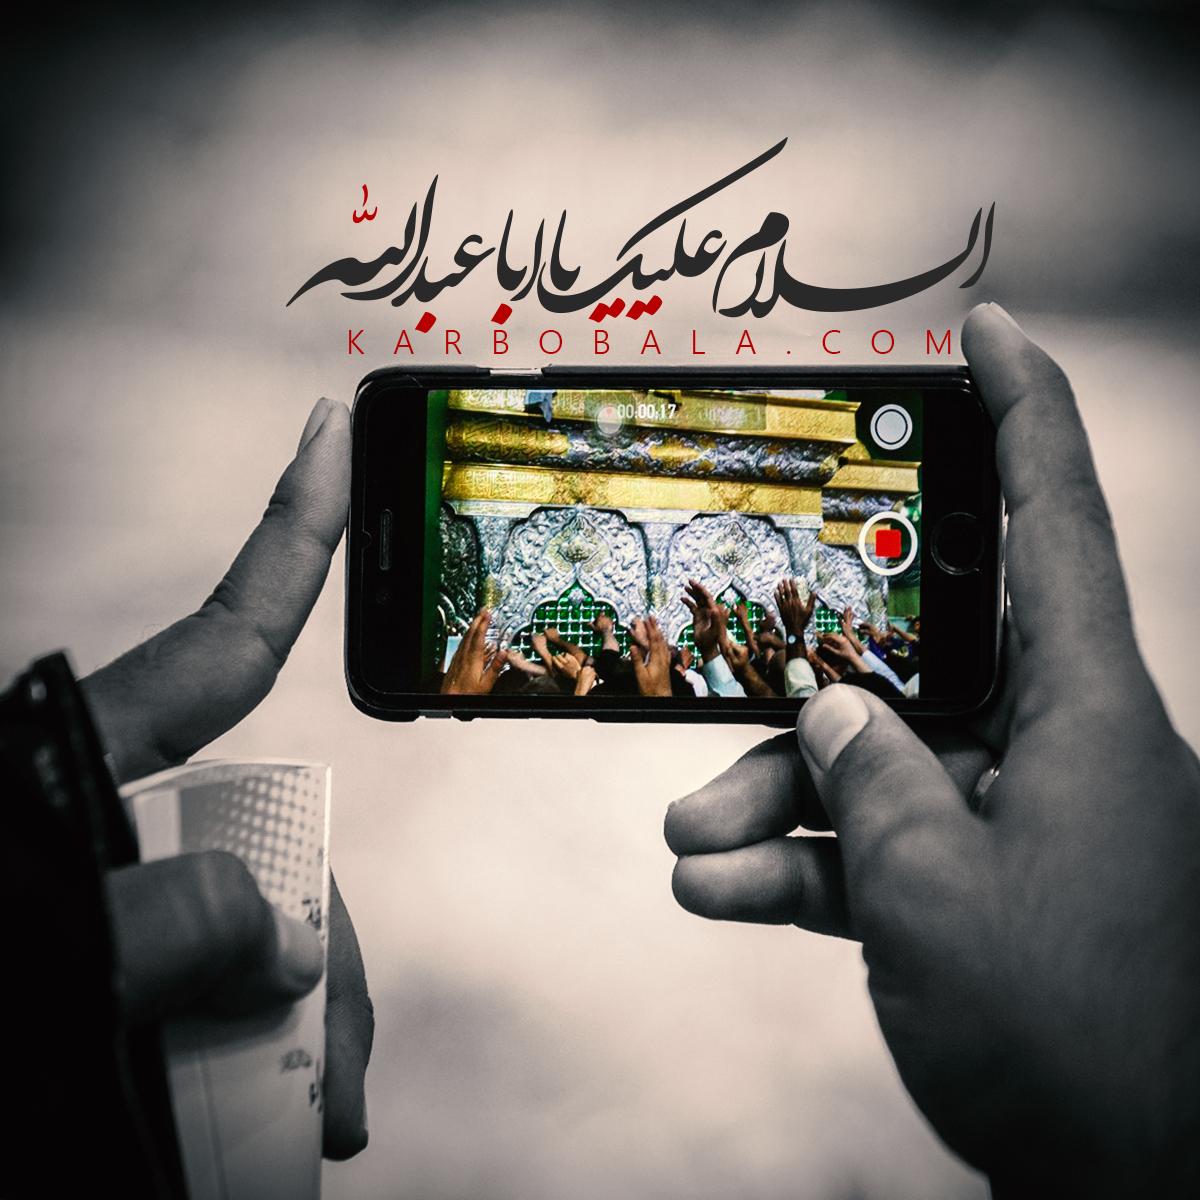 Mobile_Wallpaper(220)-Karbobala.com